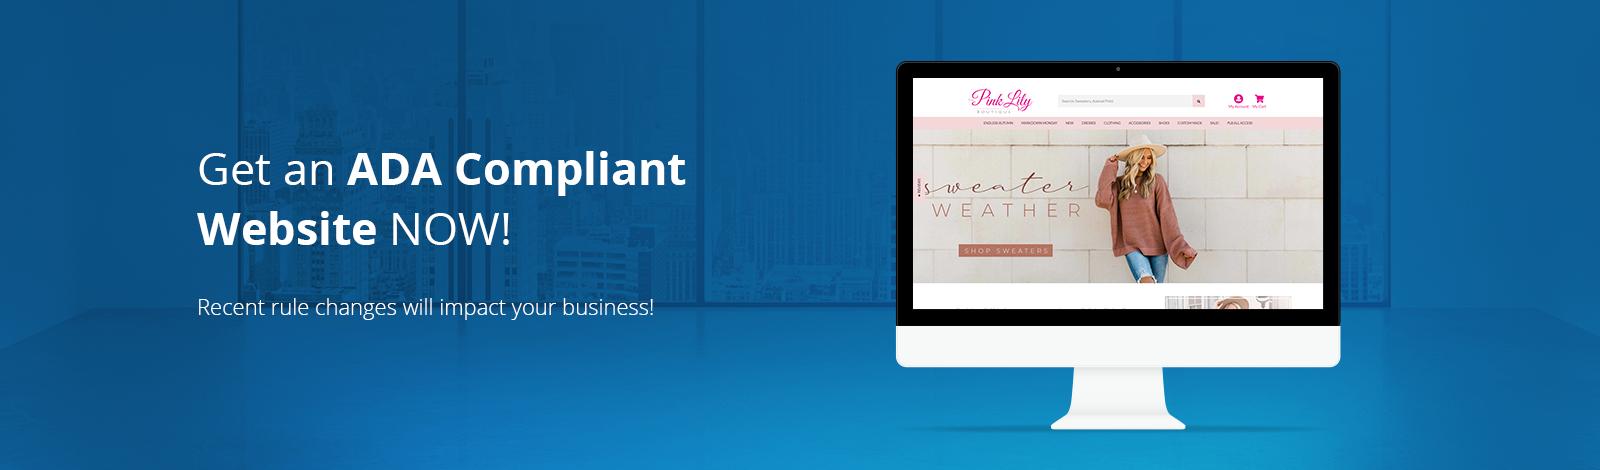 Get an ADA Compliant Website Now